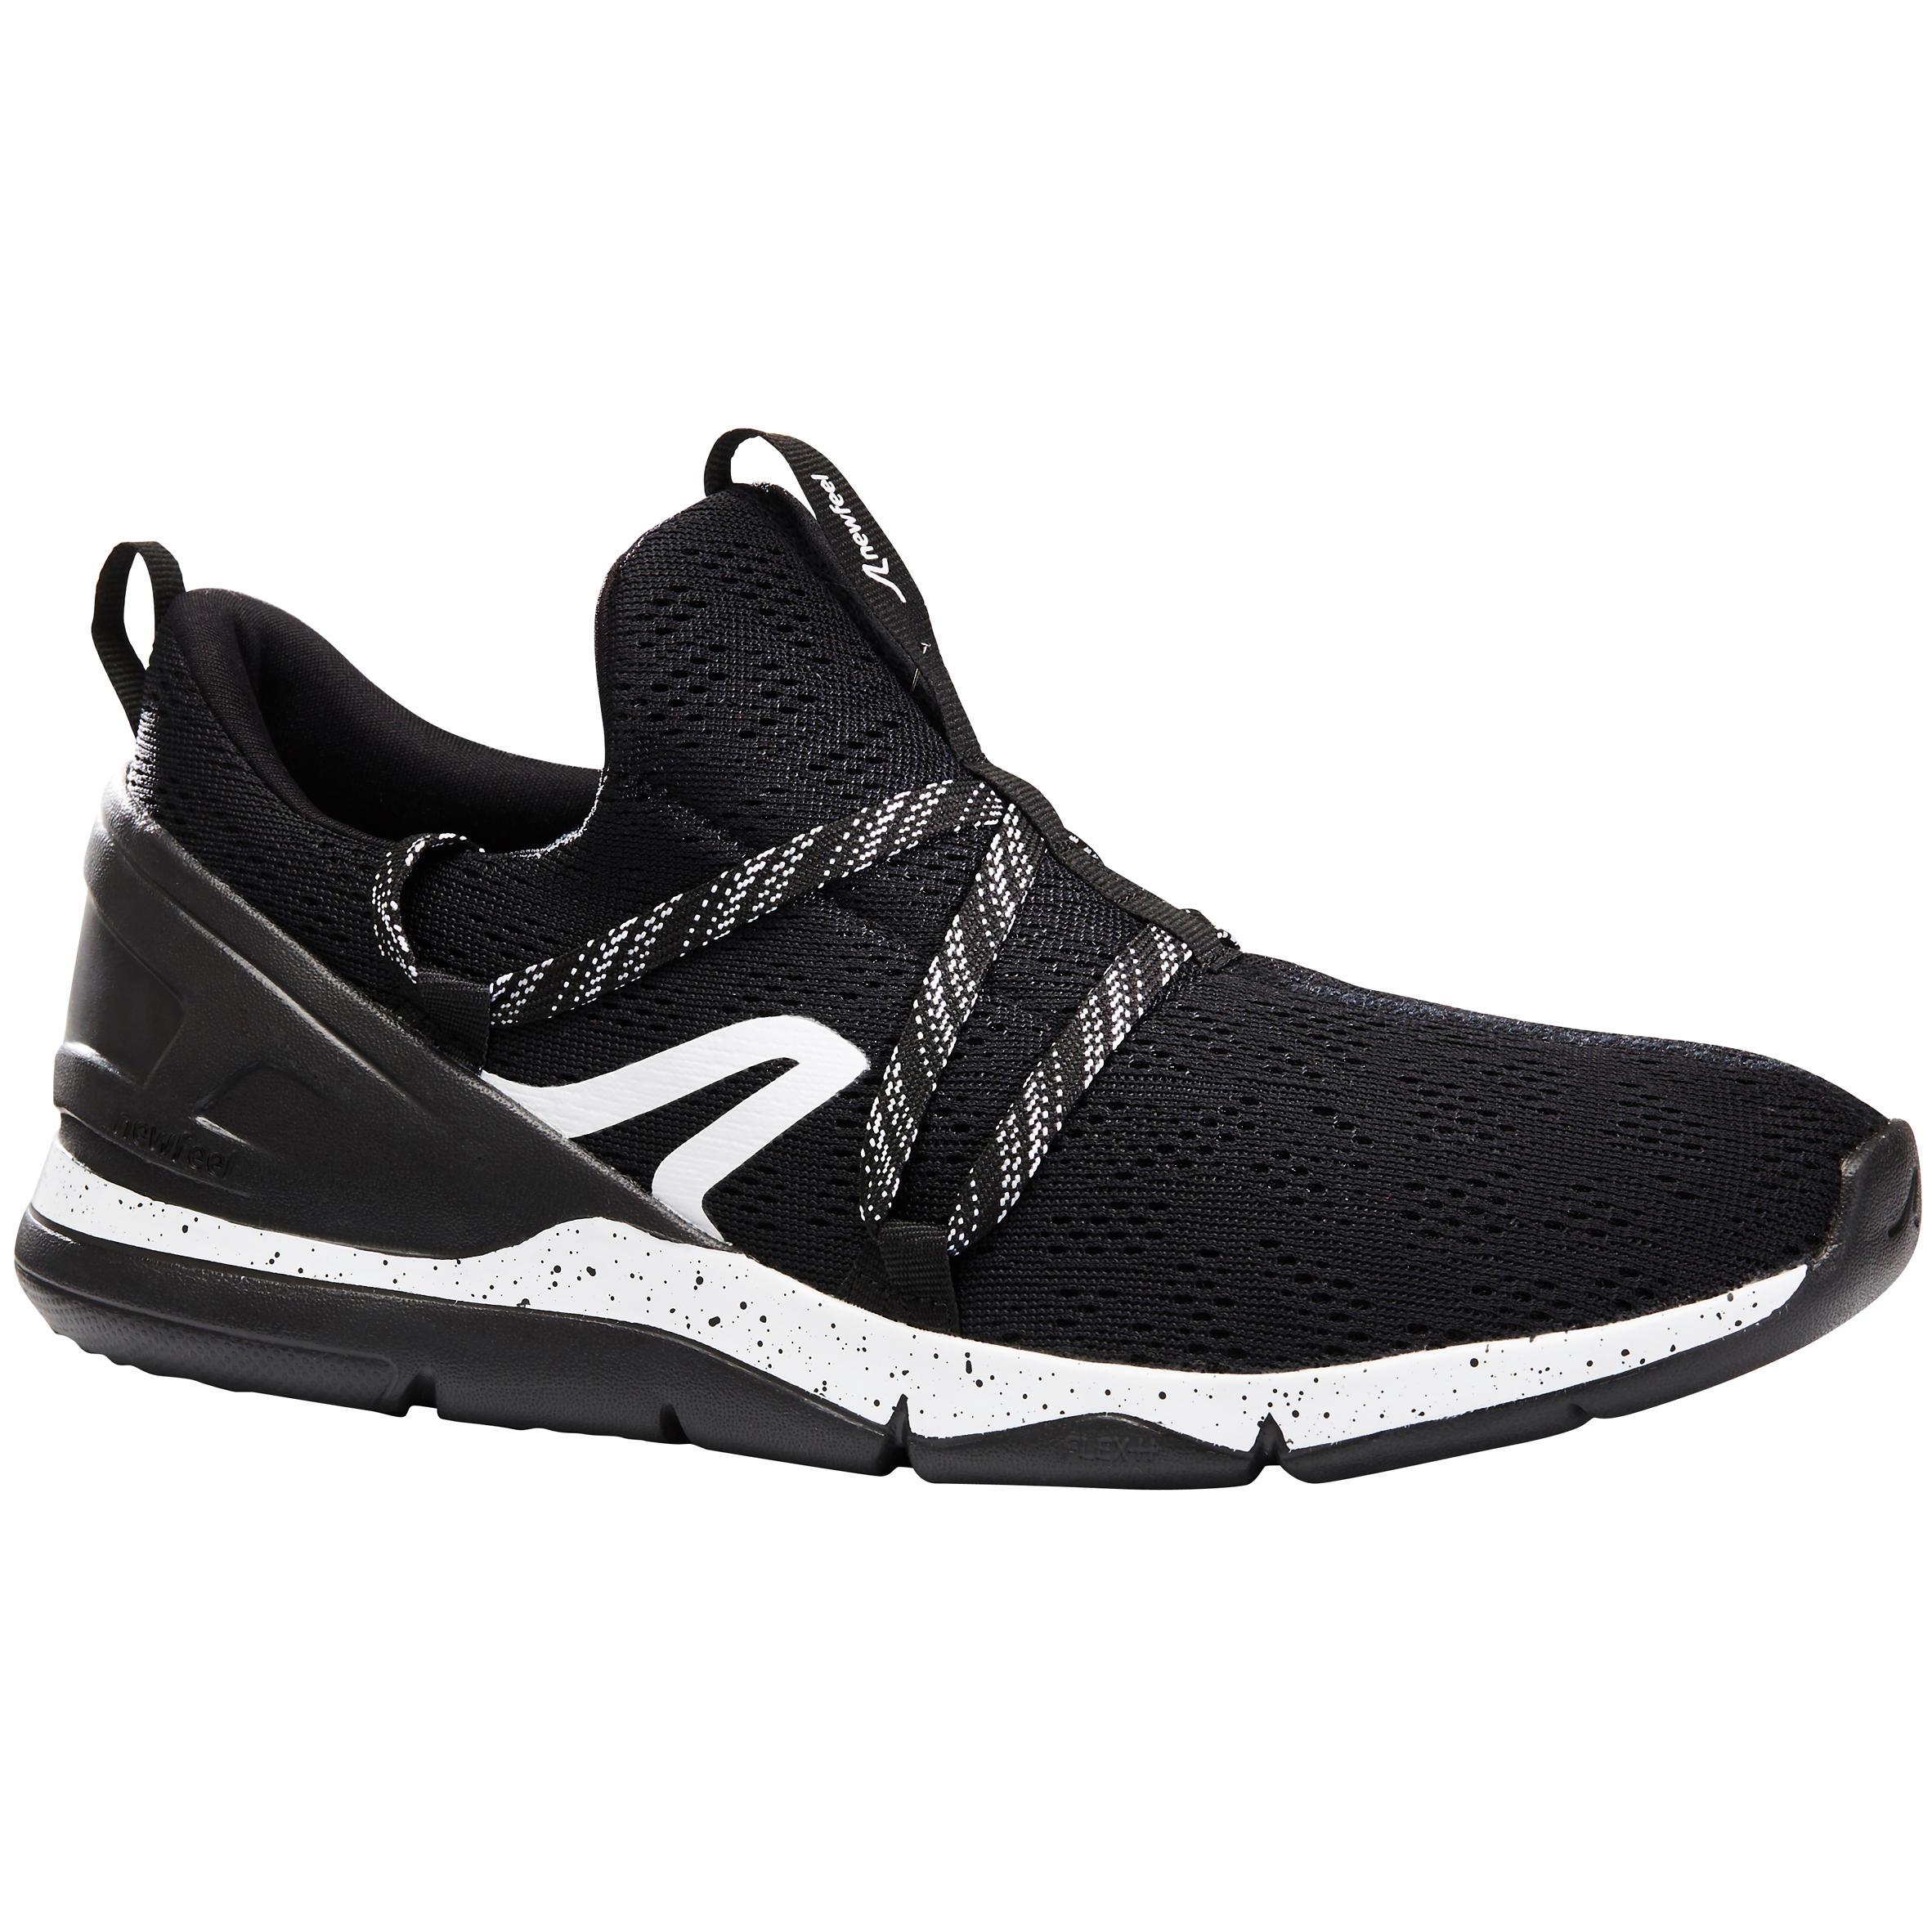 Newfeel Chaussures marche sportive homme PW 140 noir / blanc - Newfeel